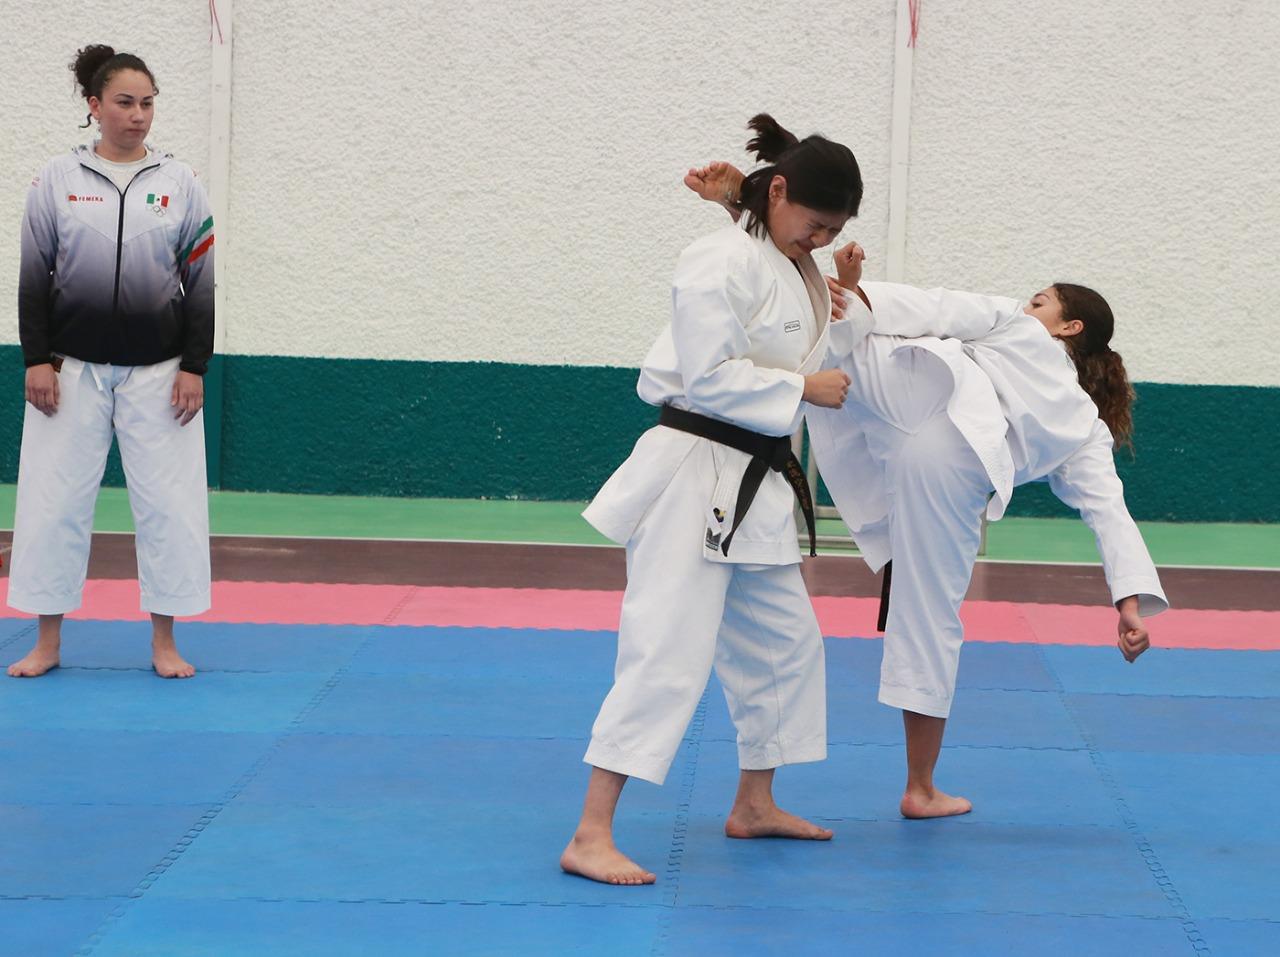 /cms/uploads/image/file/503422/Foto_3_Karate.jpg